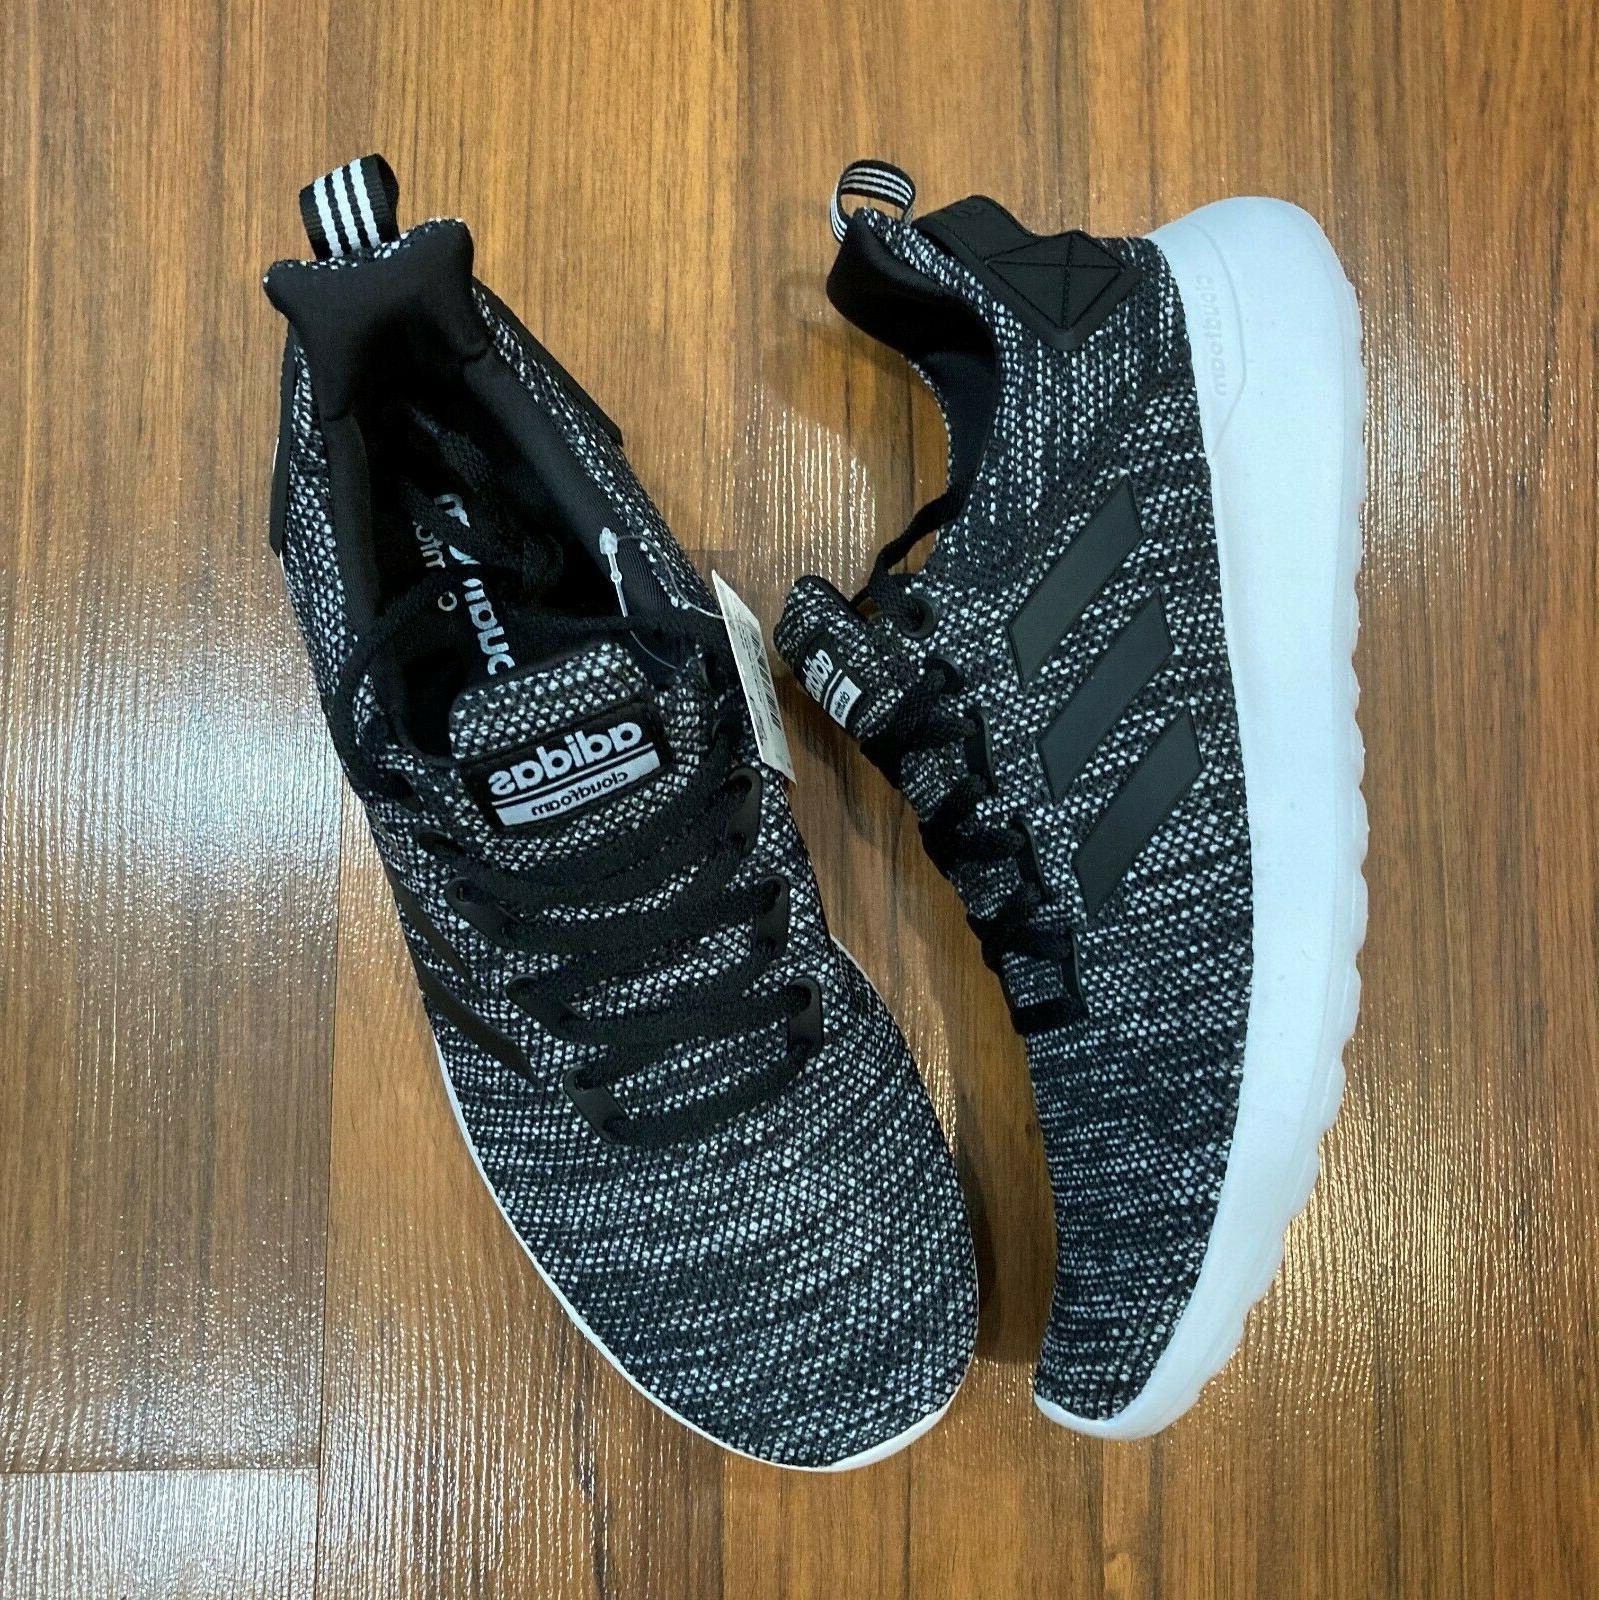 Adidas Lite BYD Men's 8.5, 10.5, 11,12 New